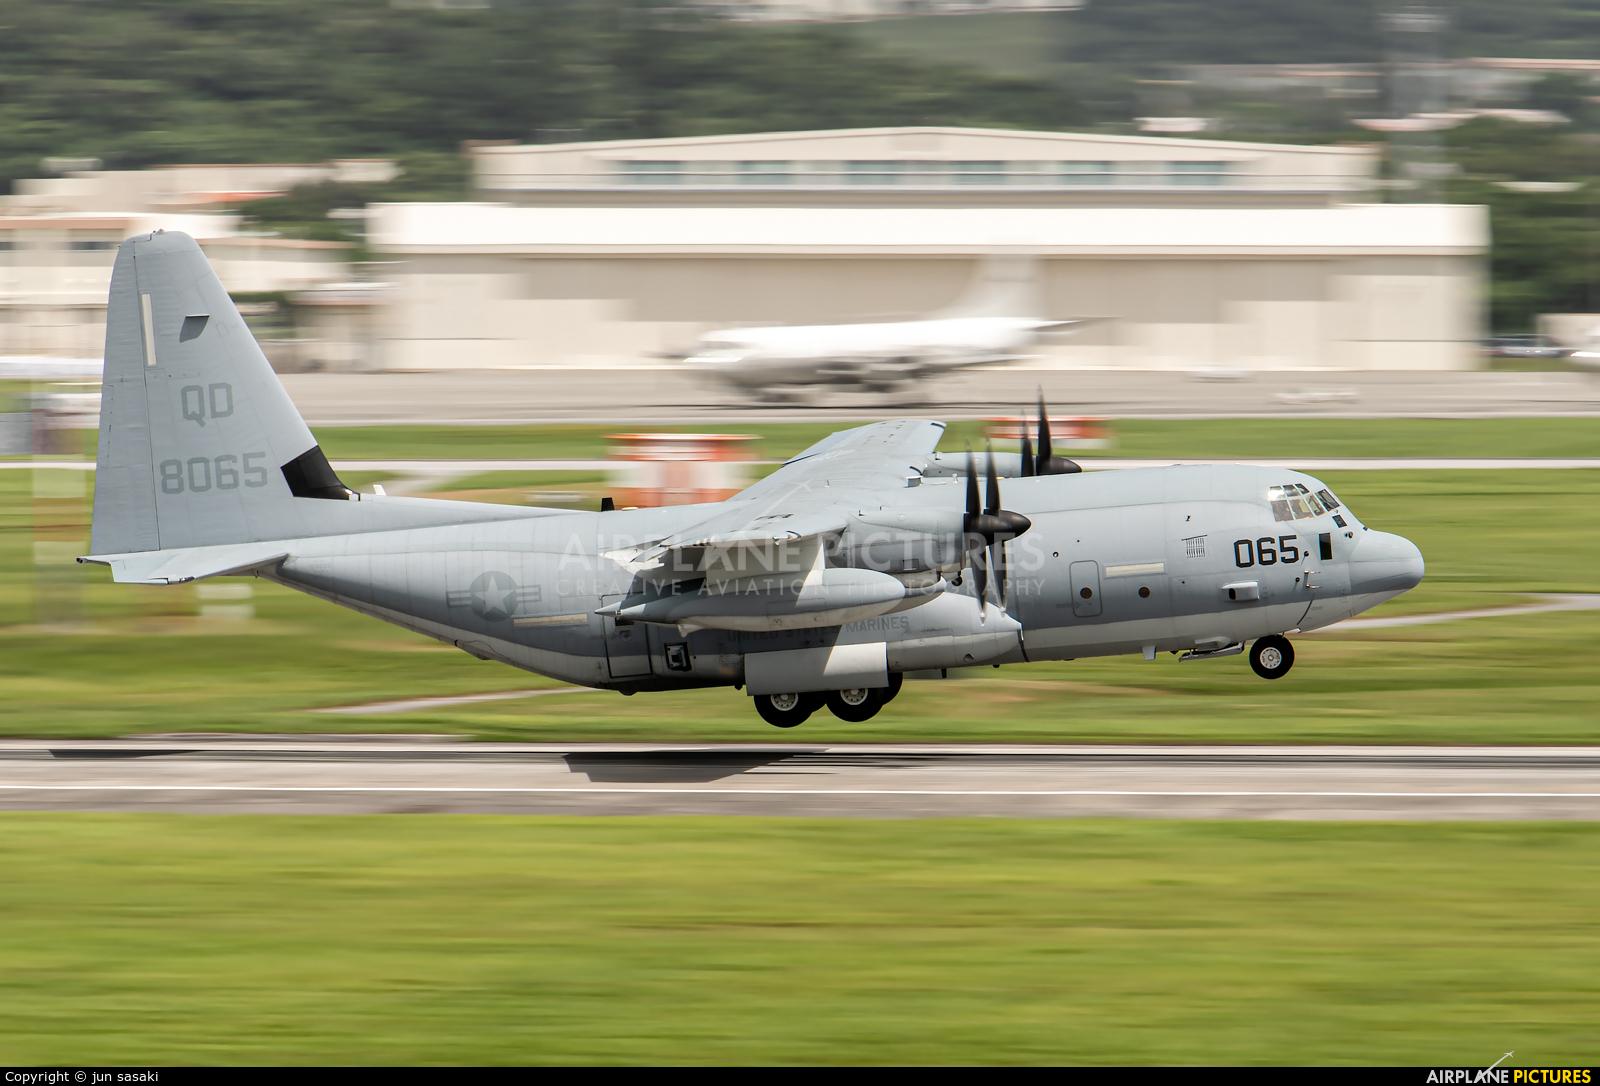 USA - Marine Corps 168065 aircraft at Kadena AB